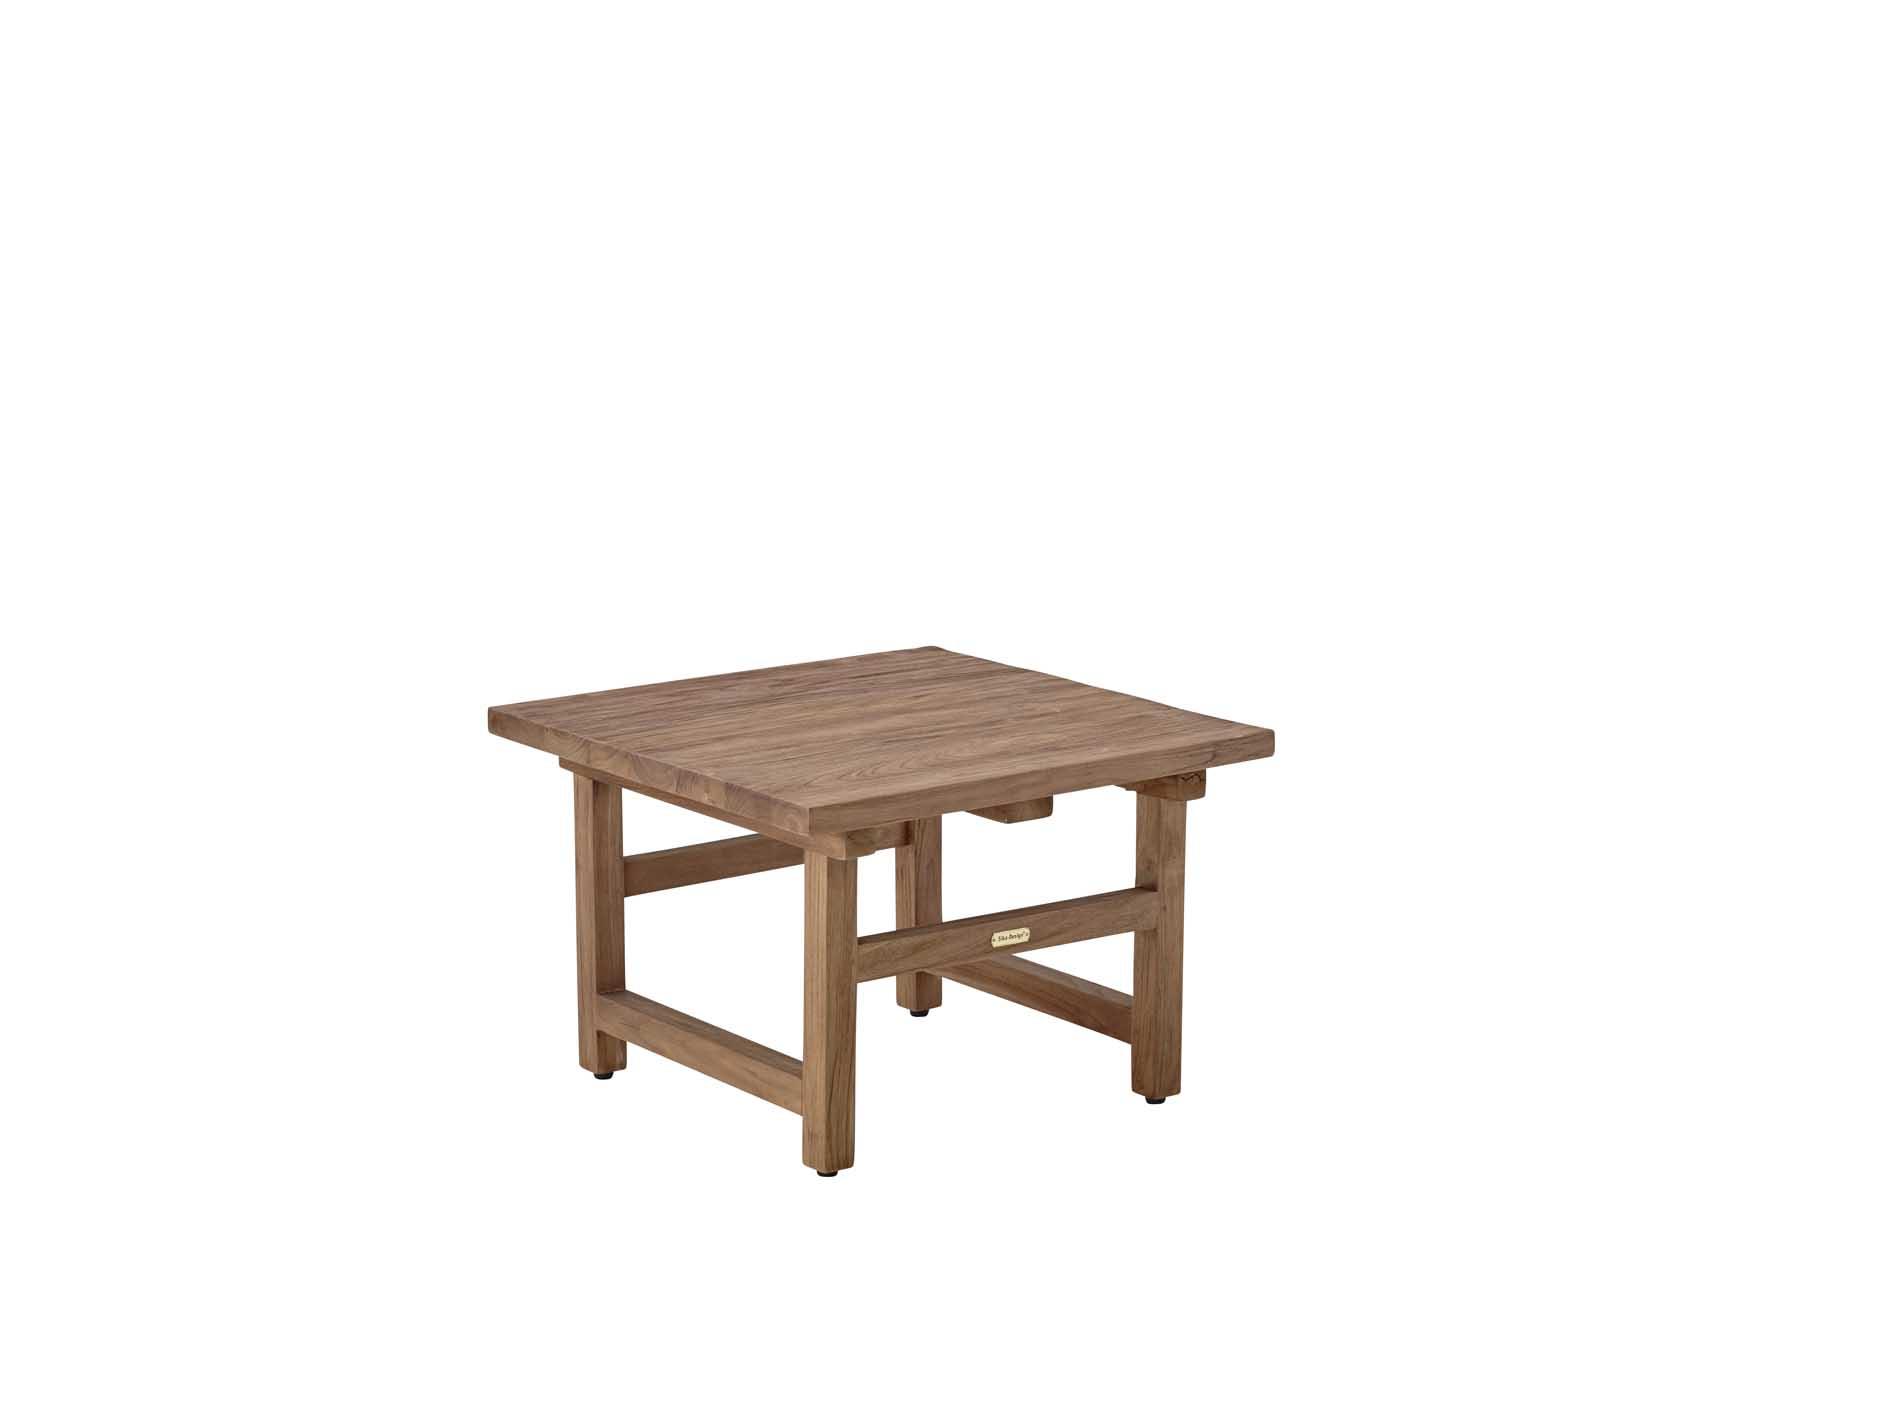 Table basse carrée en teck 60x60cm